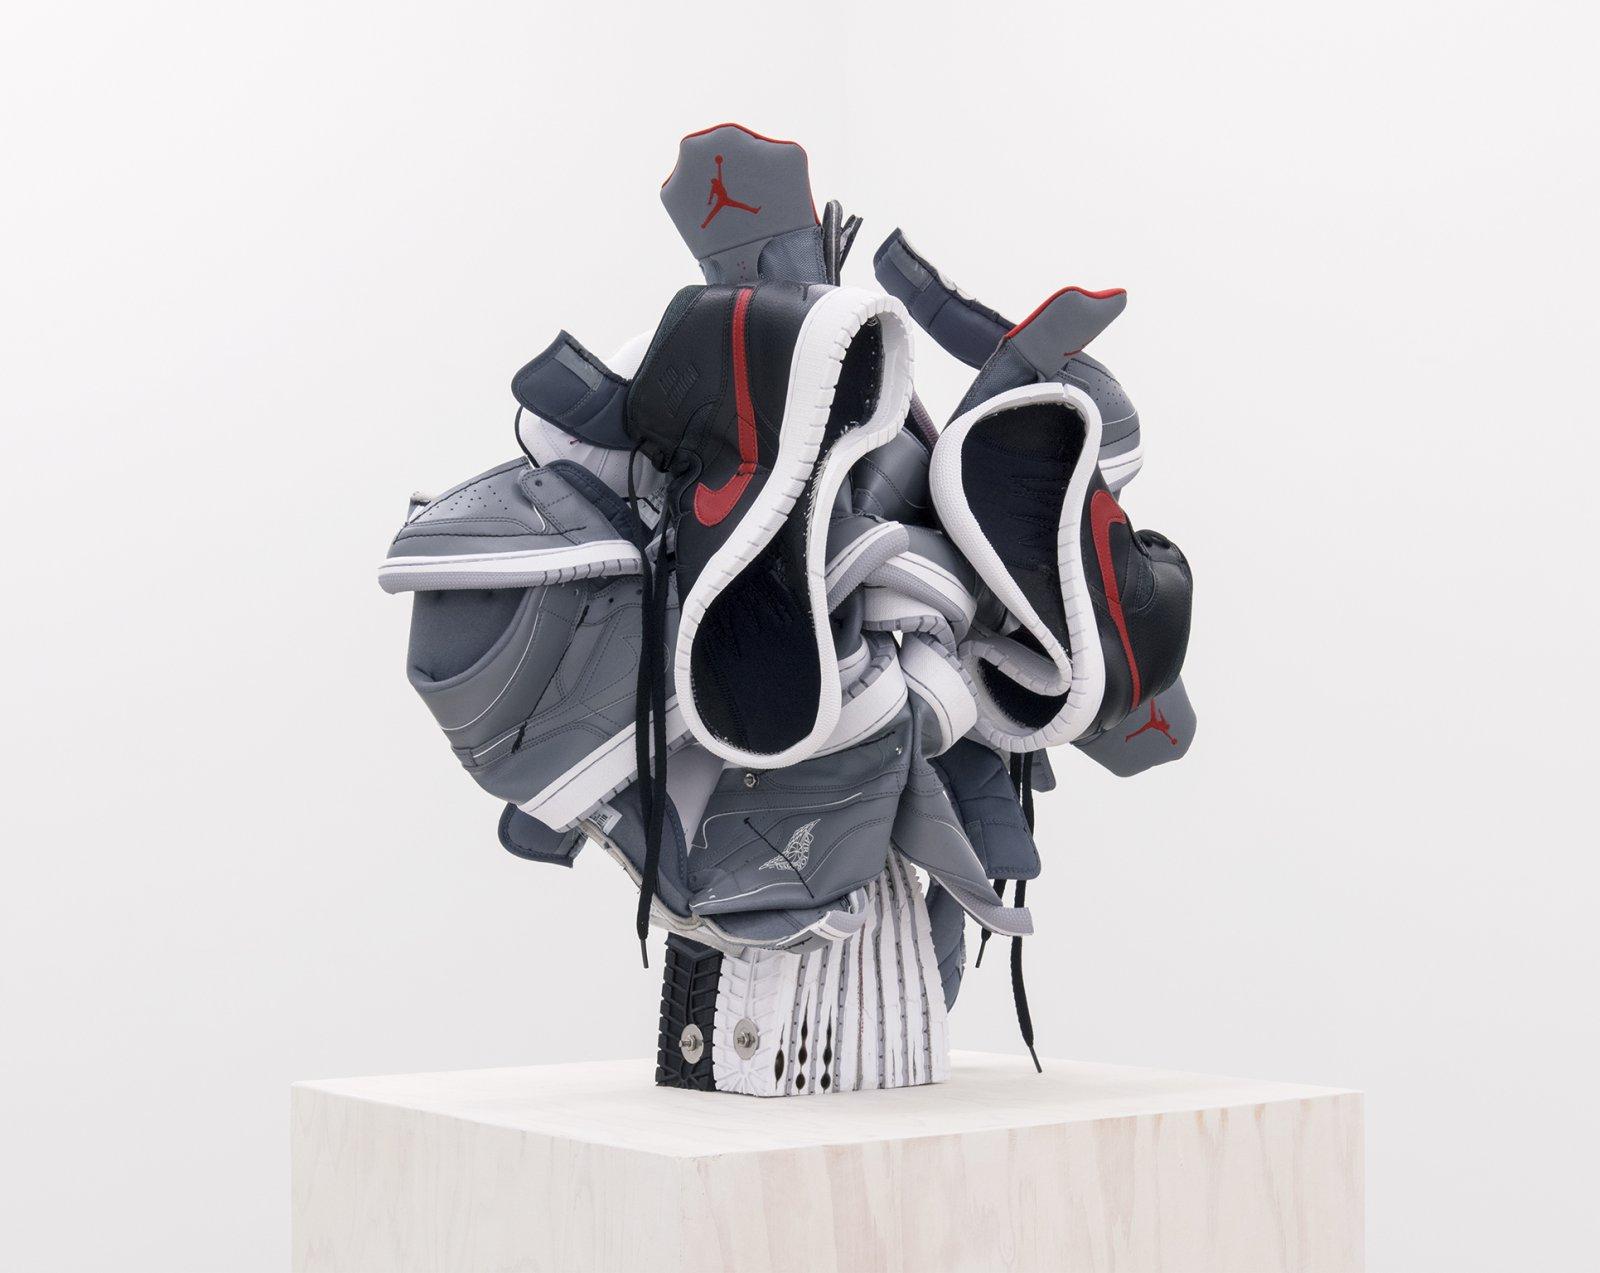 Brian Jungen, This Nameless Fear (detail), 2015–2016, nike air jordans, painted fir plywood, stainless steel, 58 x 20 x 23 in. (147 x 50 x 58 cm) by Brian Jungen